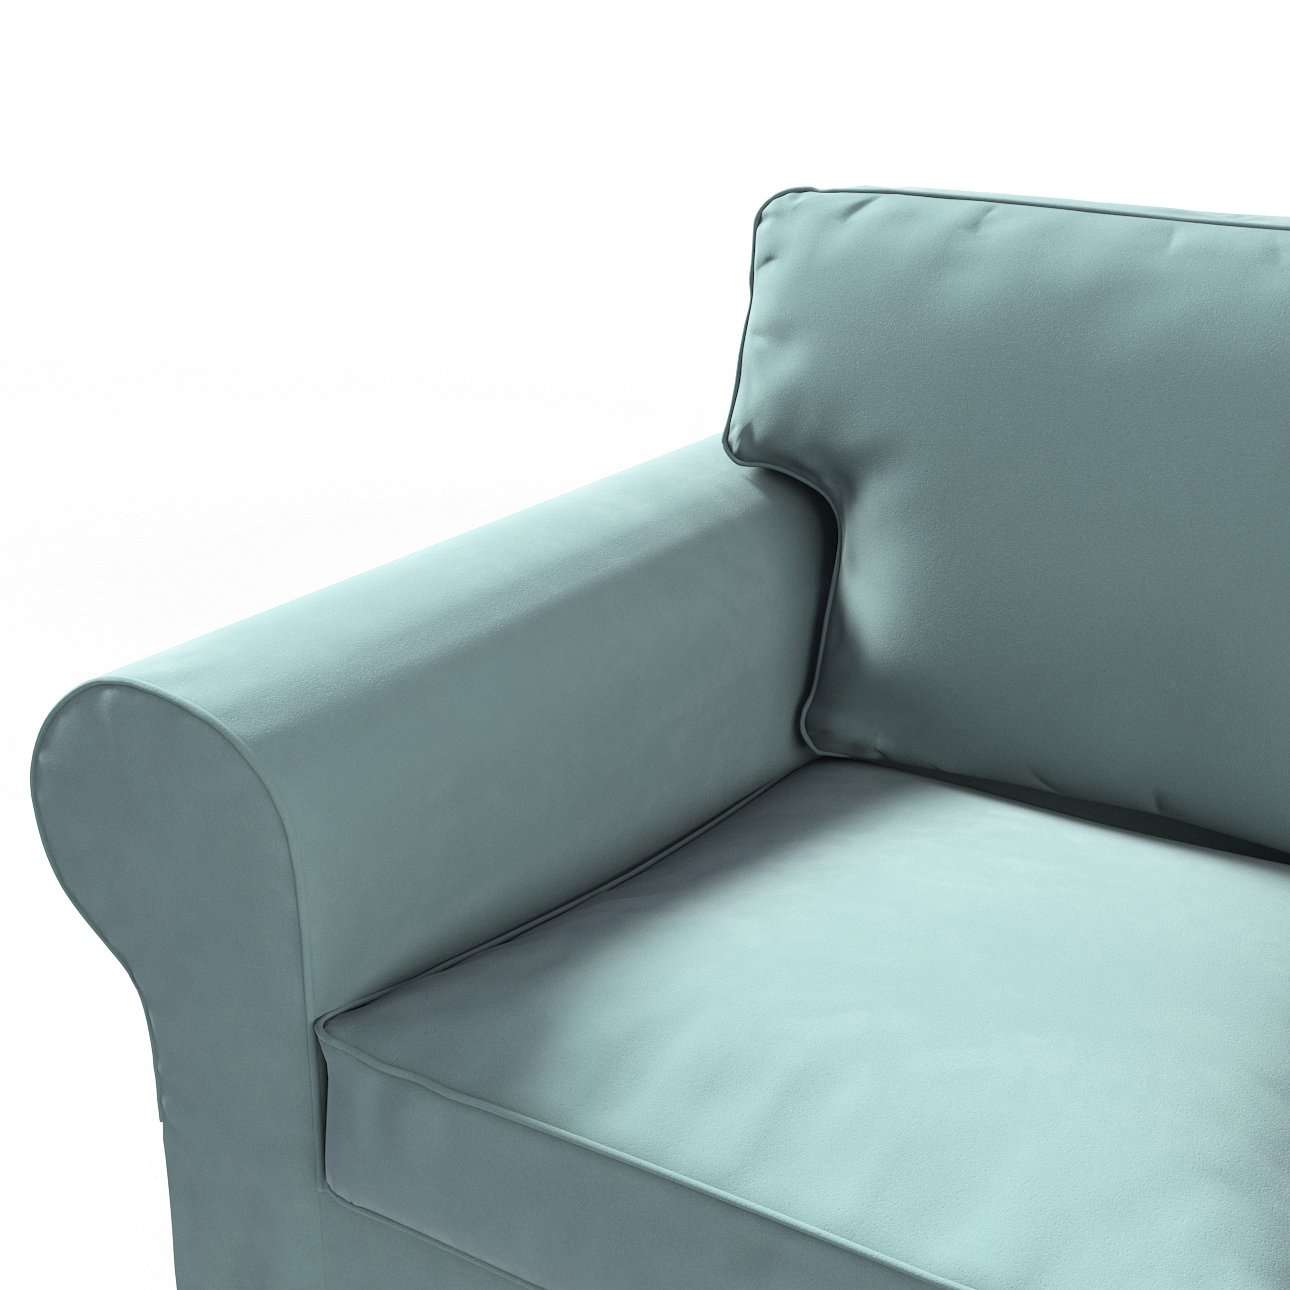 Ektorp betræk 2 sæder sovesofa gammel model<br/>Bredde ca 195cm fra kollektionen Velvet, Stof: 704-18